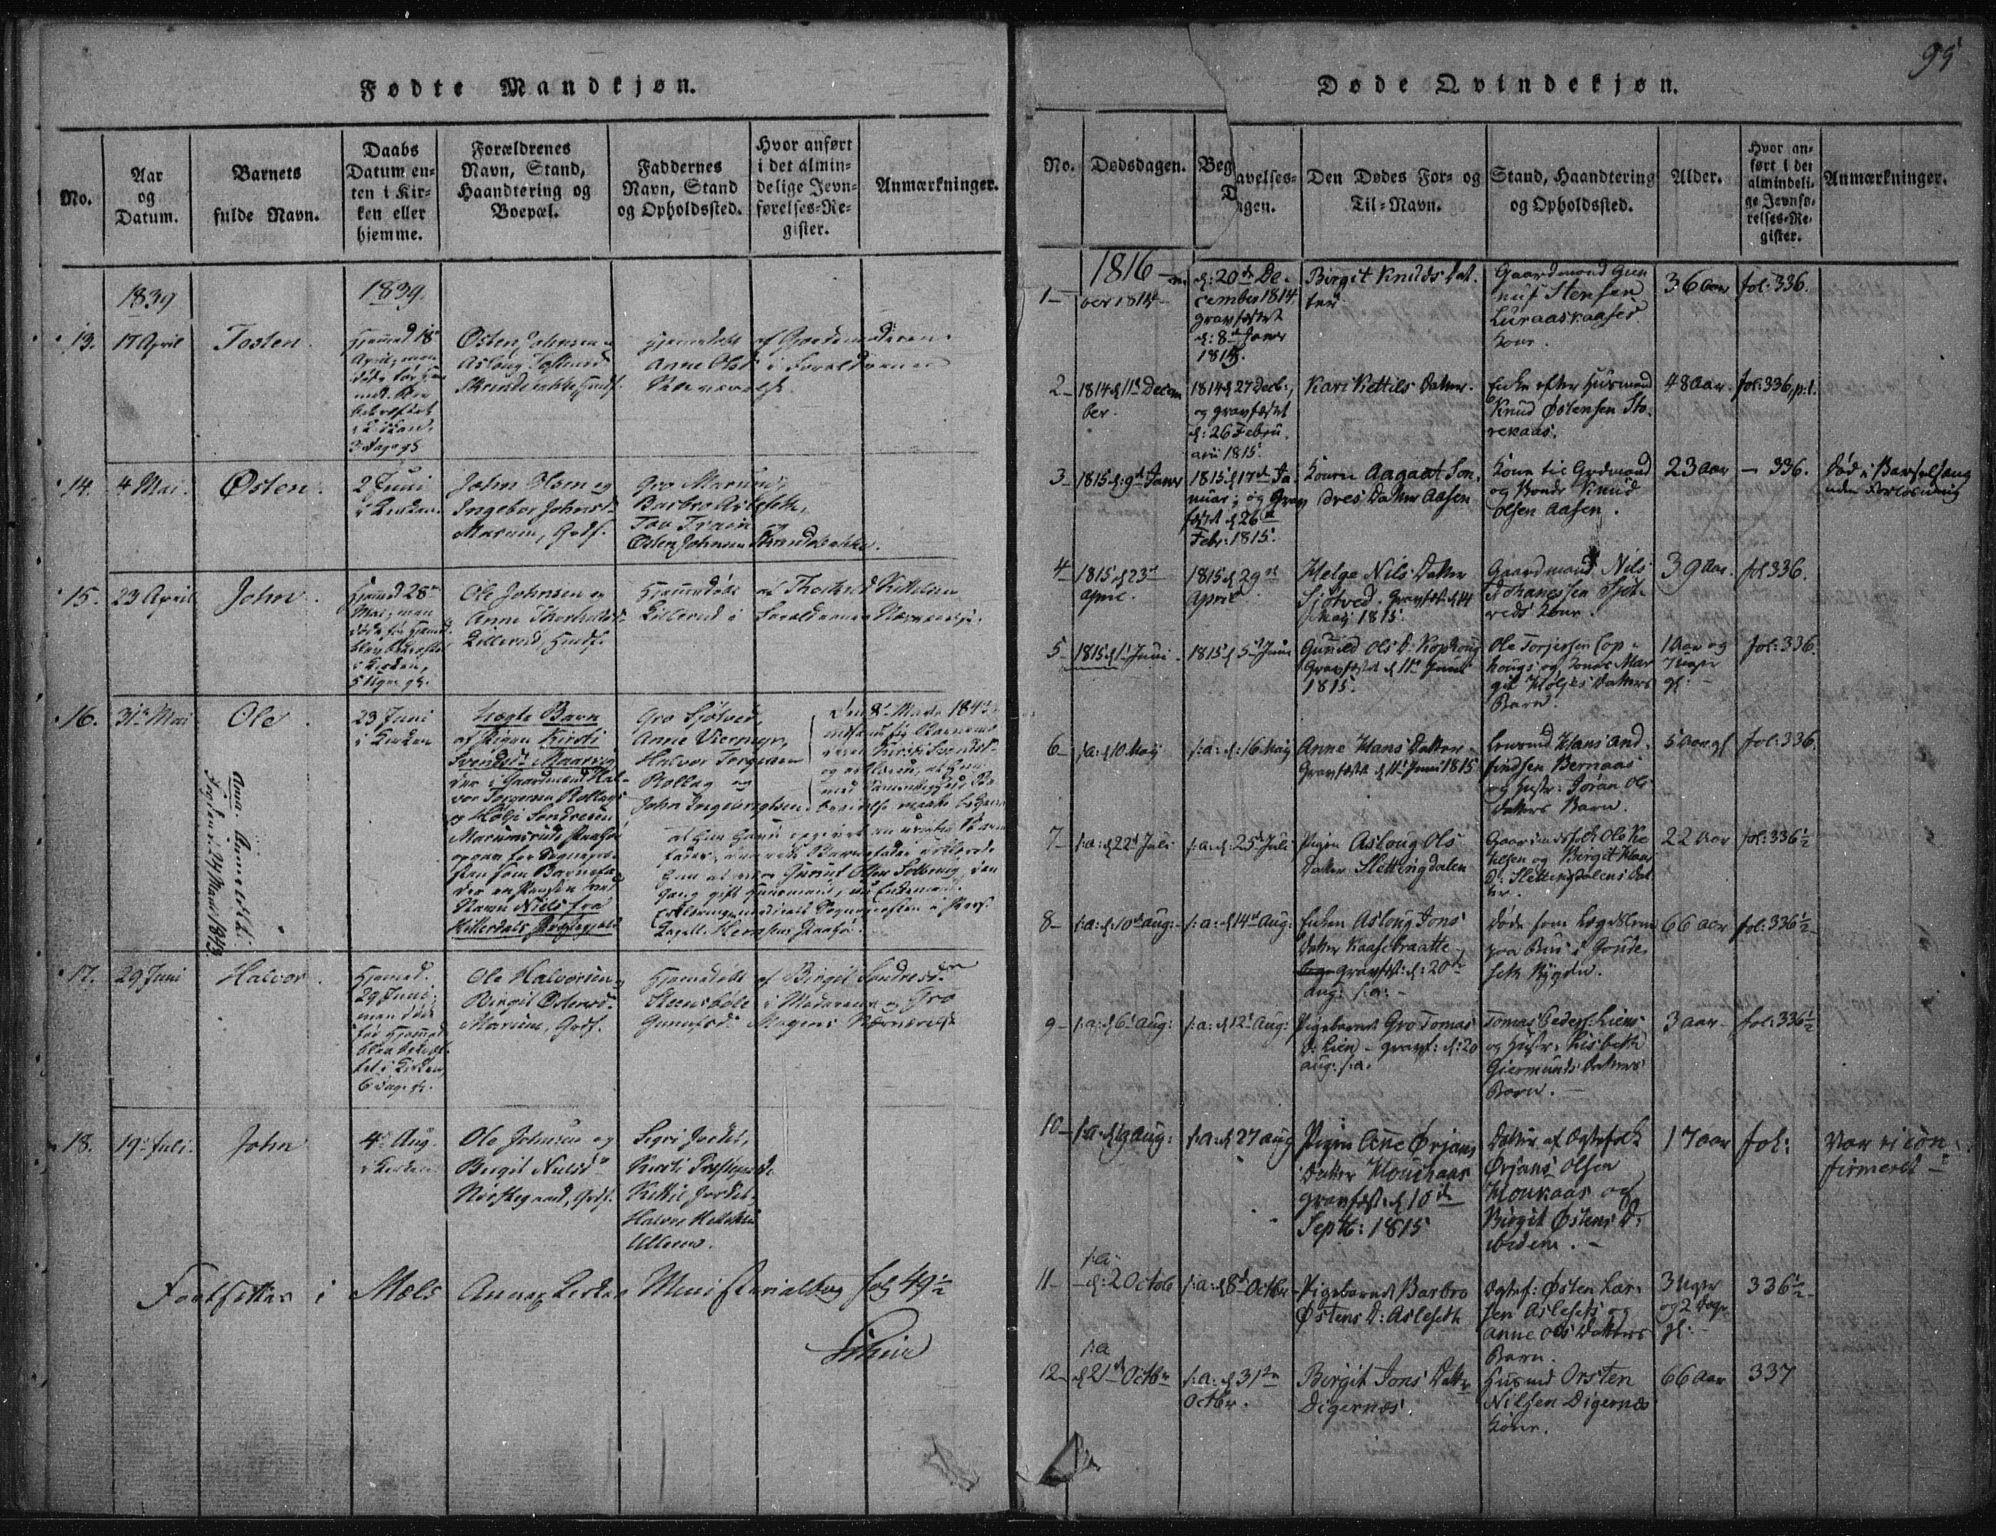 SAKO, Tinn kirkebøker, F/Fa/L0004: Ministerialbok nr. I 4, 1815-1843, s. 95